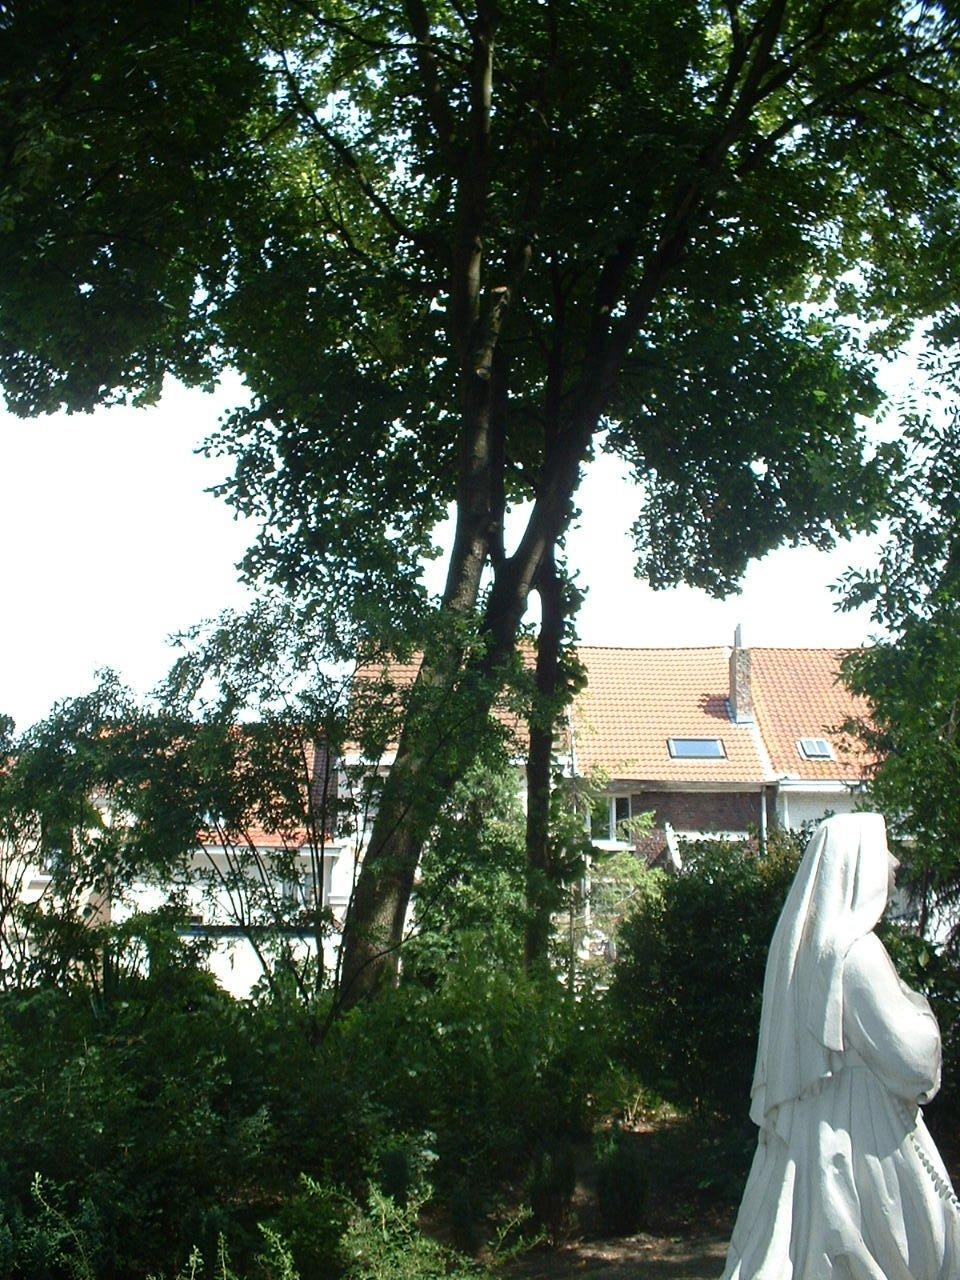 Acer pseudoplatanus f. aureovariegatum – Jette, Grotplein en openbare tuin, Leopold I straat –  19 Juli 2005